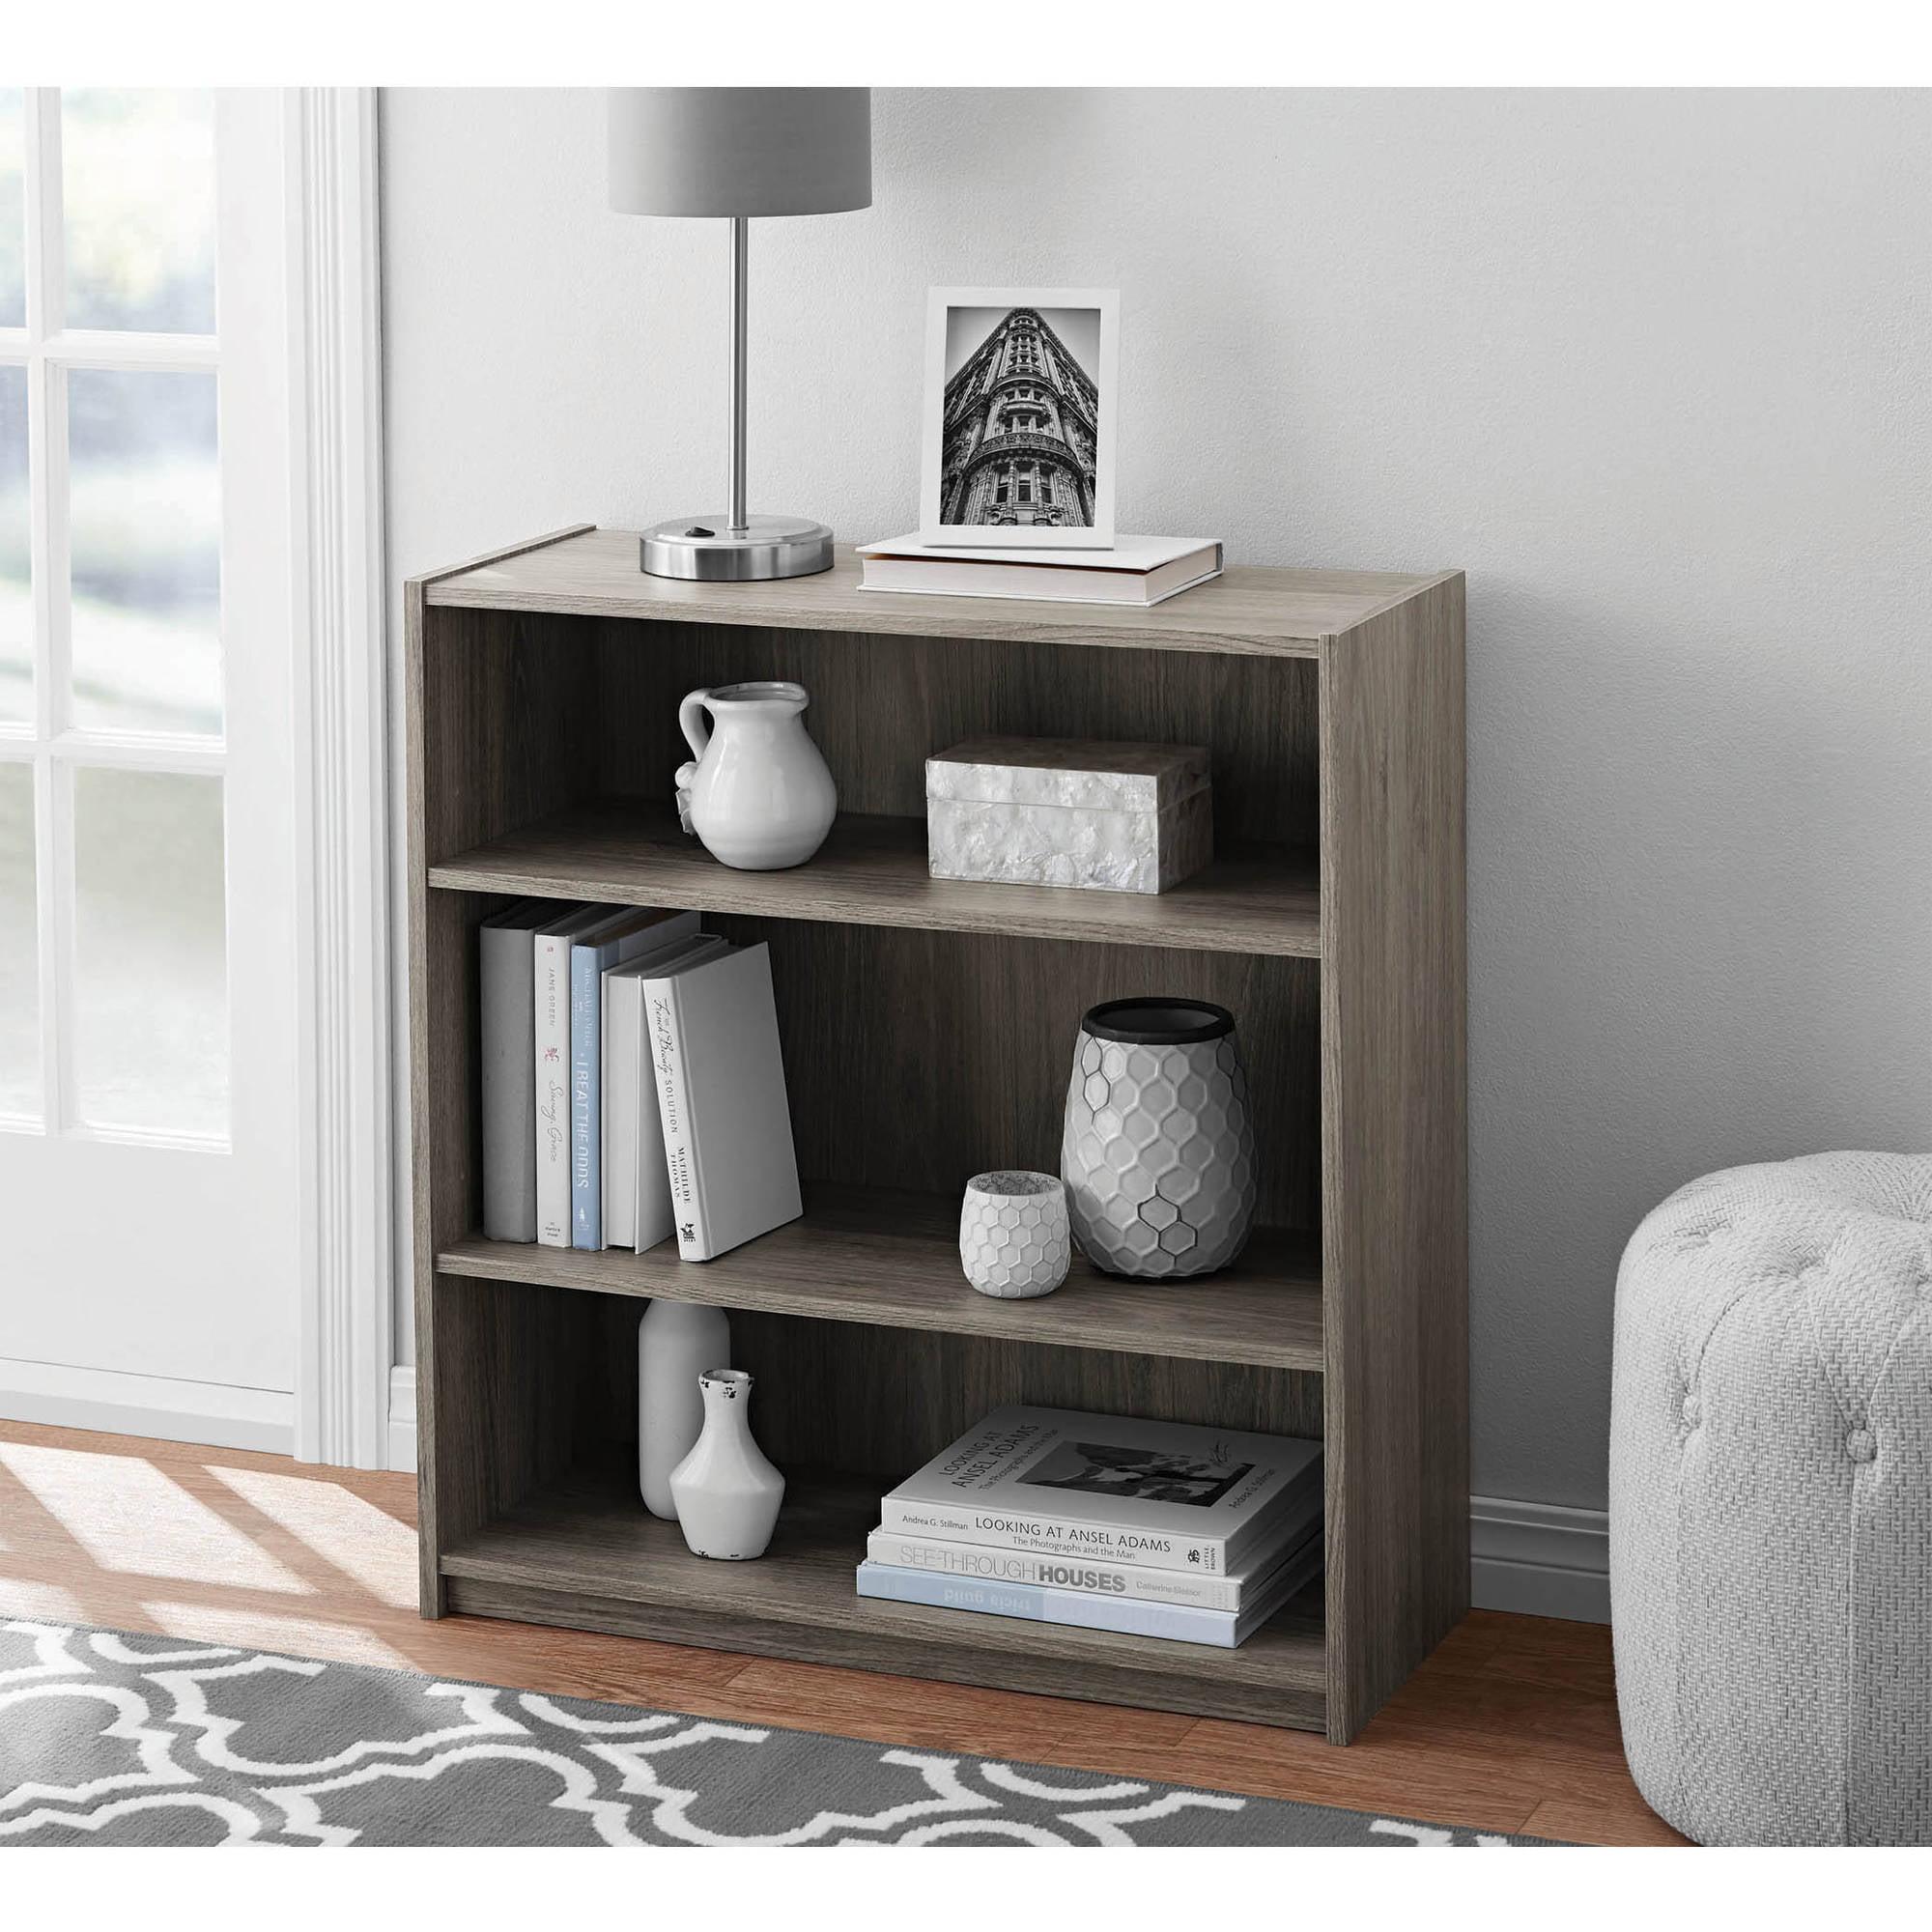 Book Furniture: Adjustable 3 Shelf Wood Bookcase Storage Shelving Book